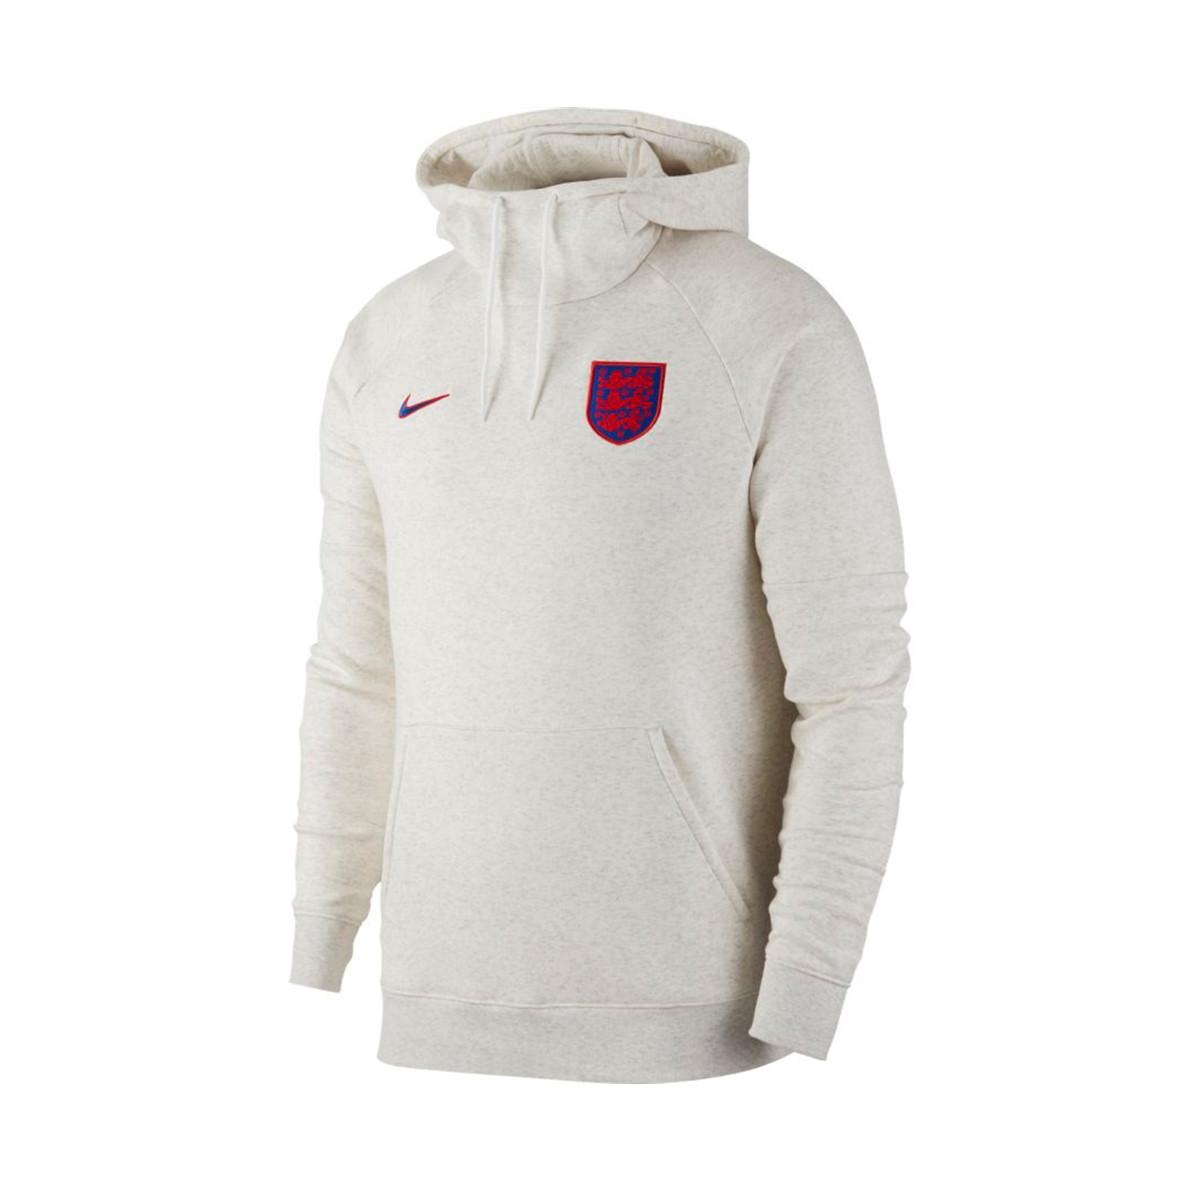 Felpa Nike Nazionale Inglese Fleece Hoodie 2020-2021